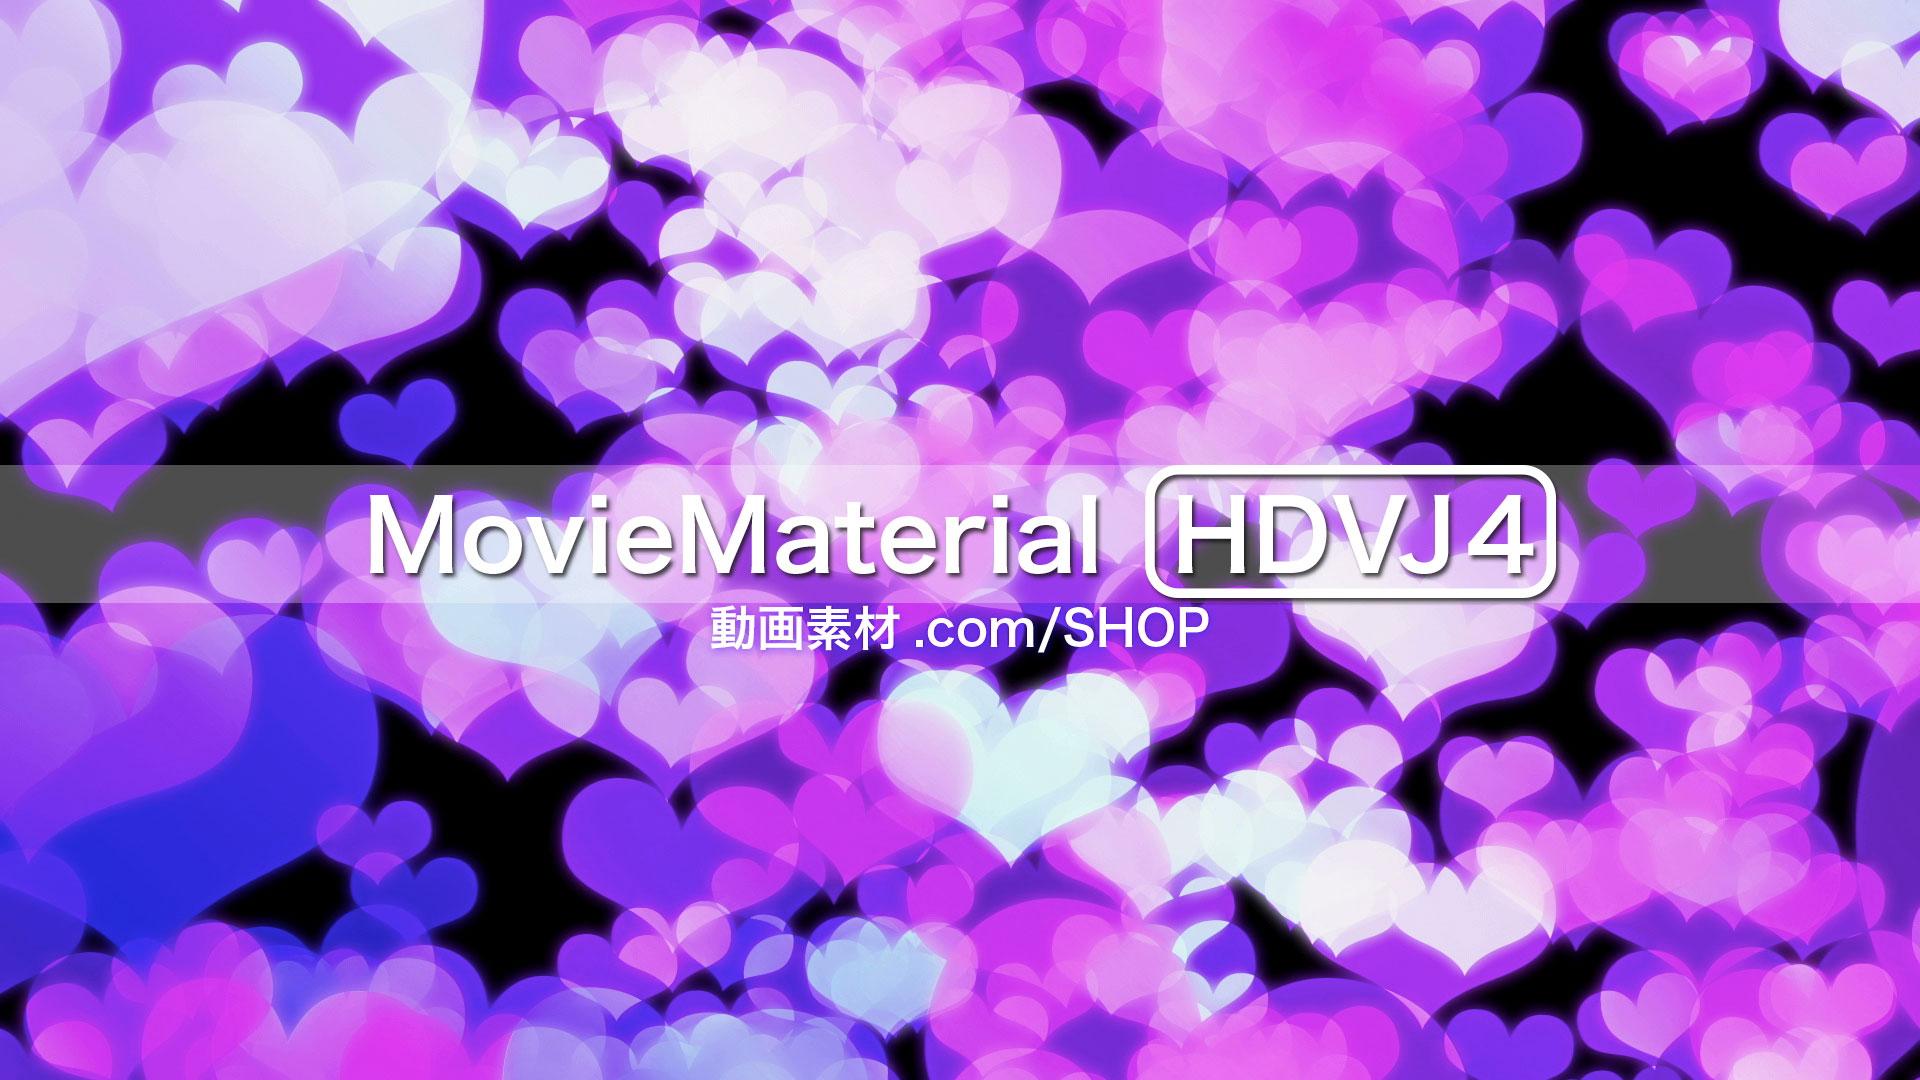 MovieMaterial HDVJ4 フルハイビジョンVJ動画素材集 画像5